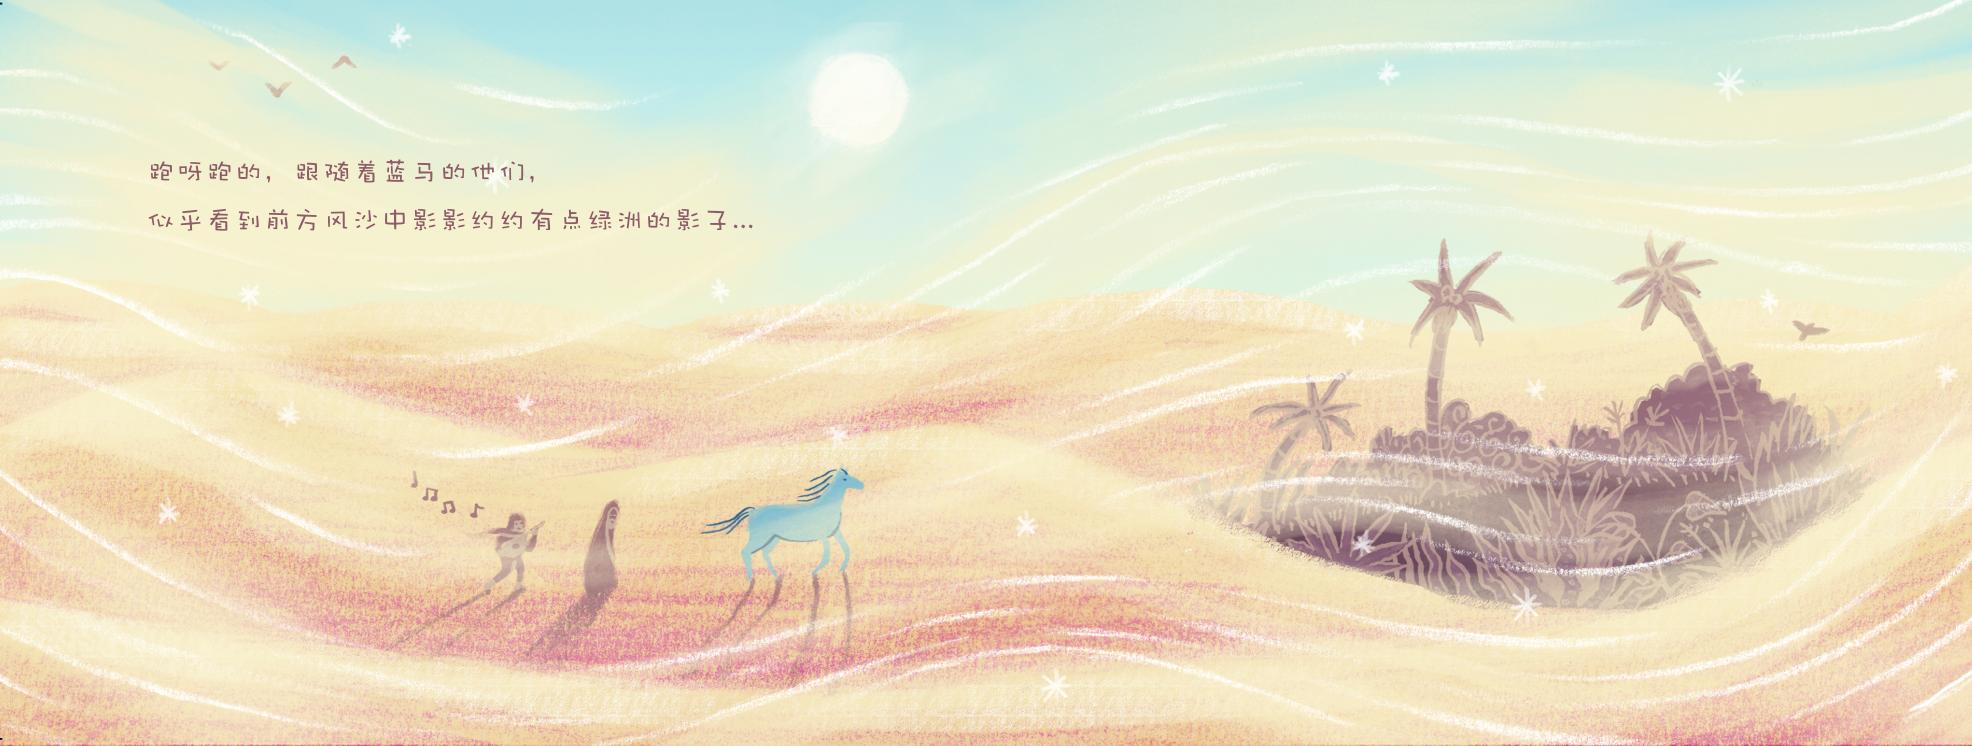 the blue horse - A Children's Book